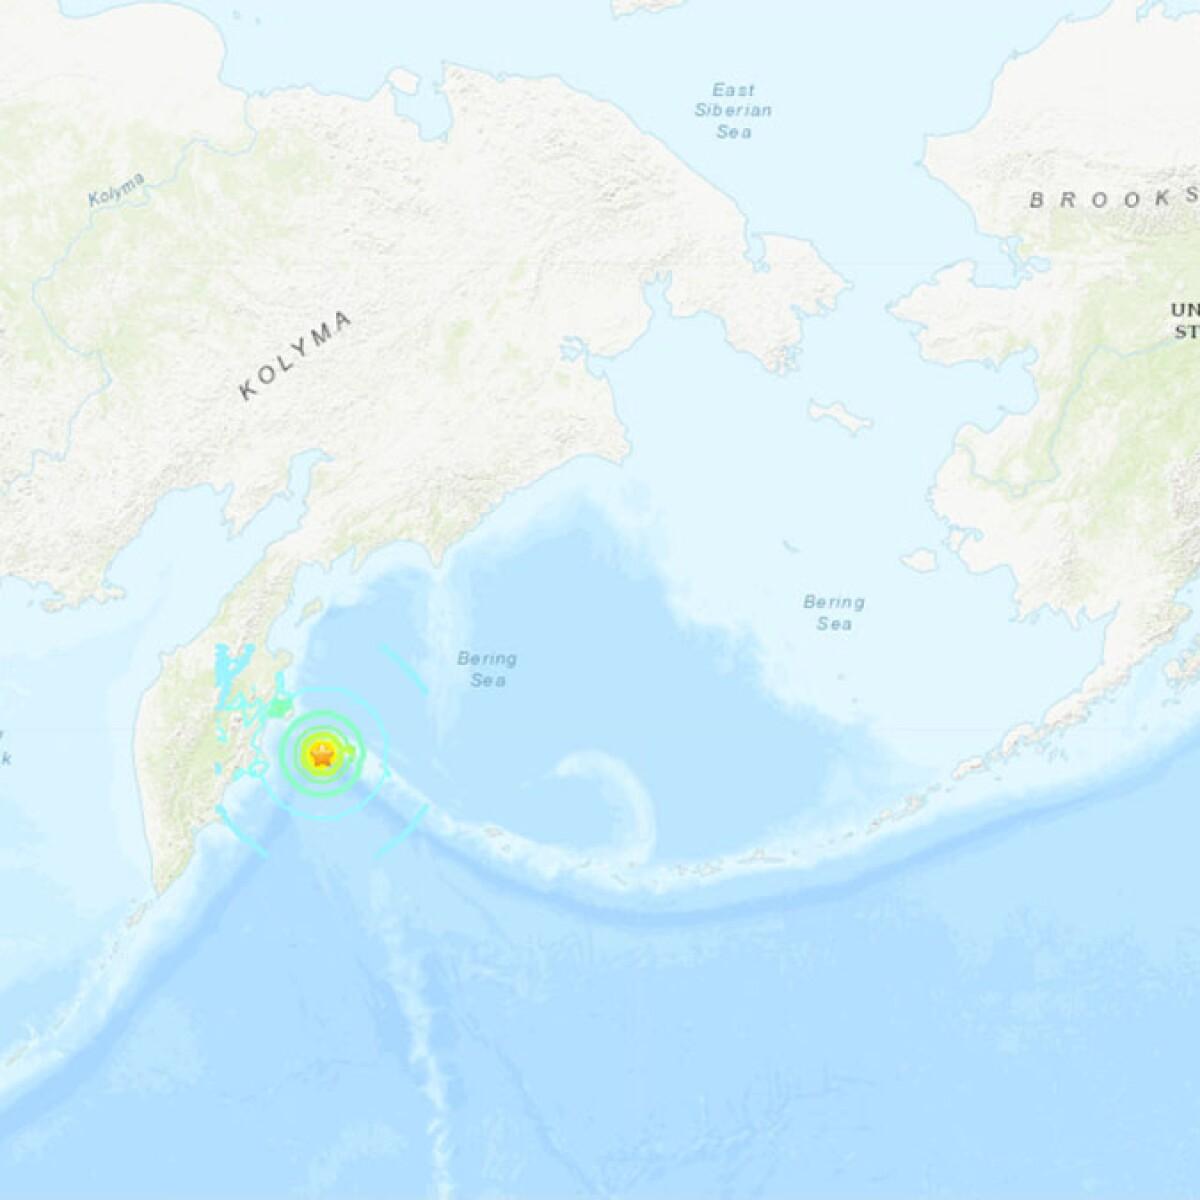 Strong quake off Russia coast triggers tsunami warning